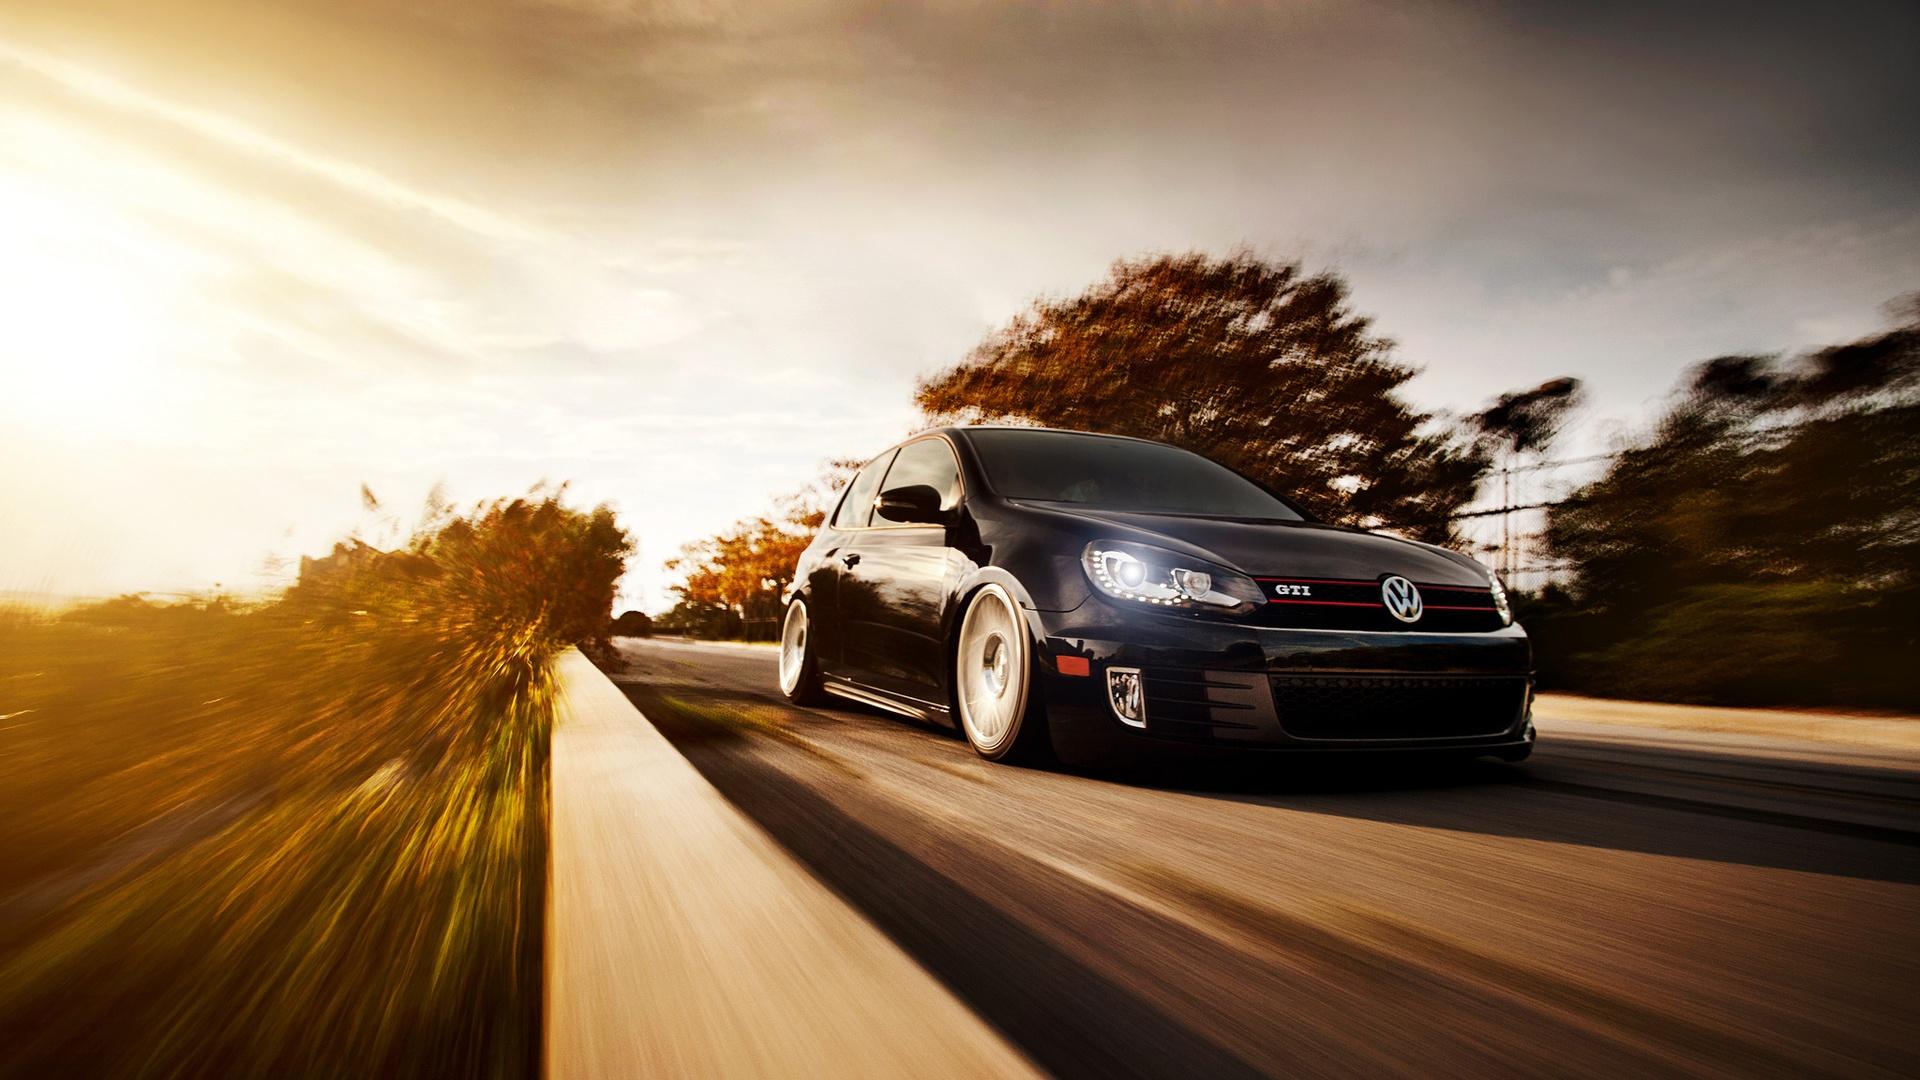 Wallpaper Volkswagen Golf GTI, black color car, road, sunset 1920x1200 HD Picture, Image